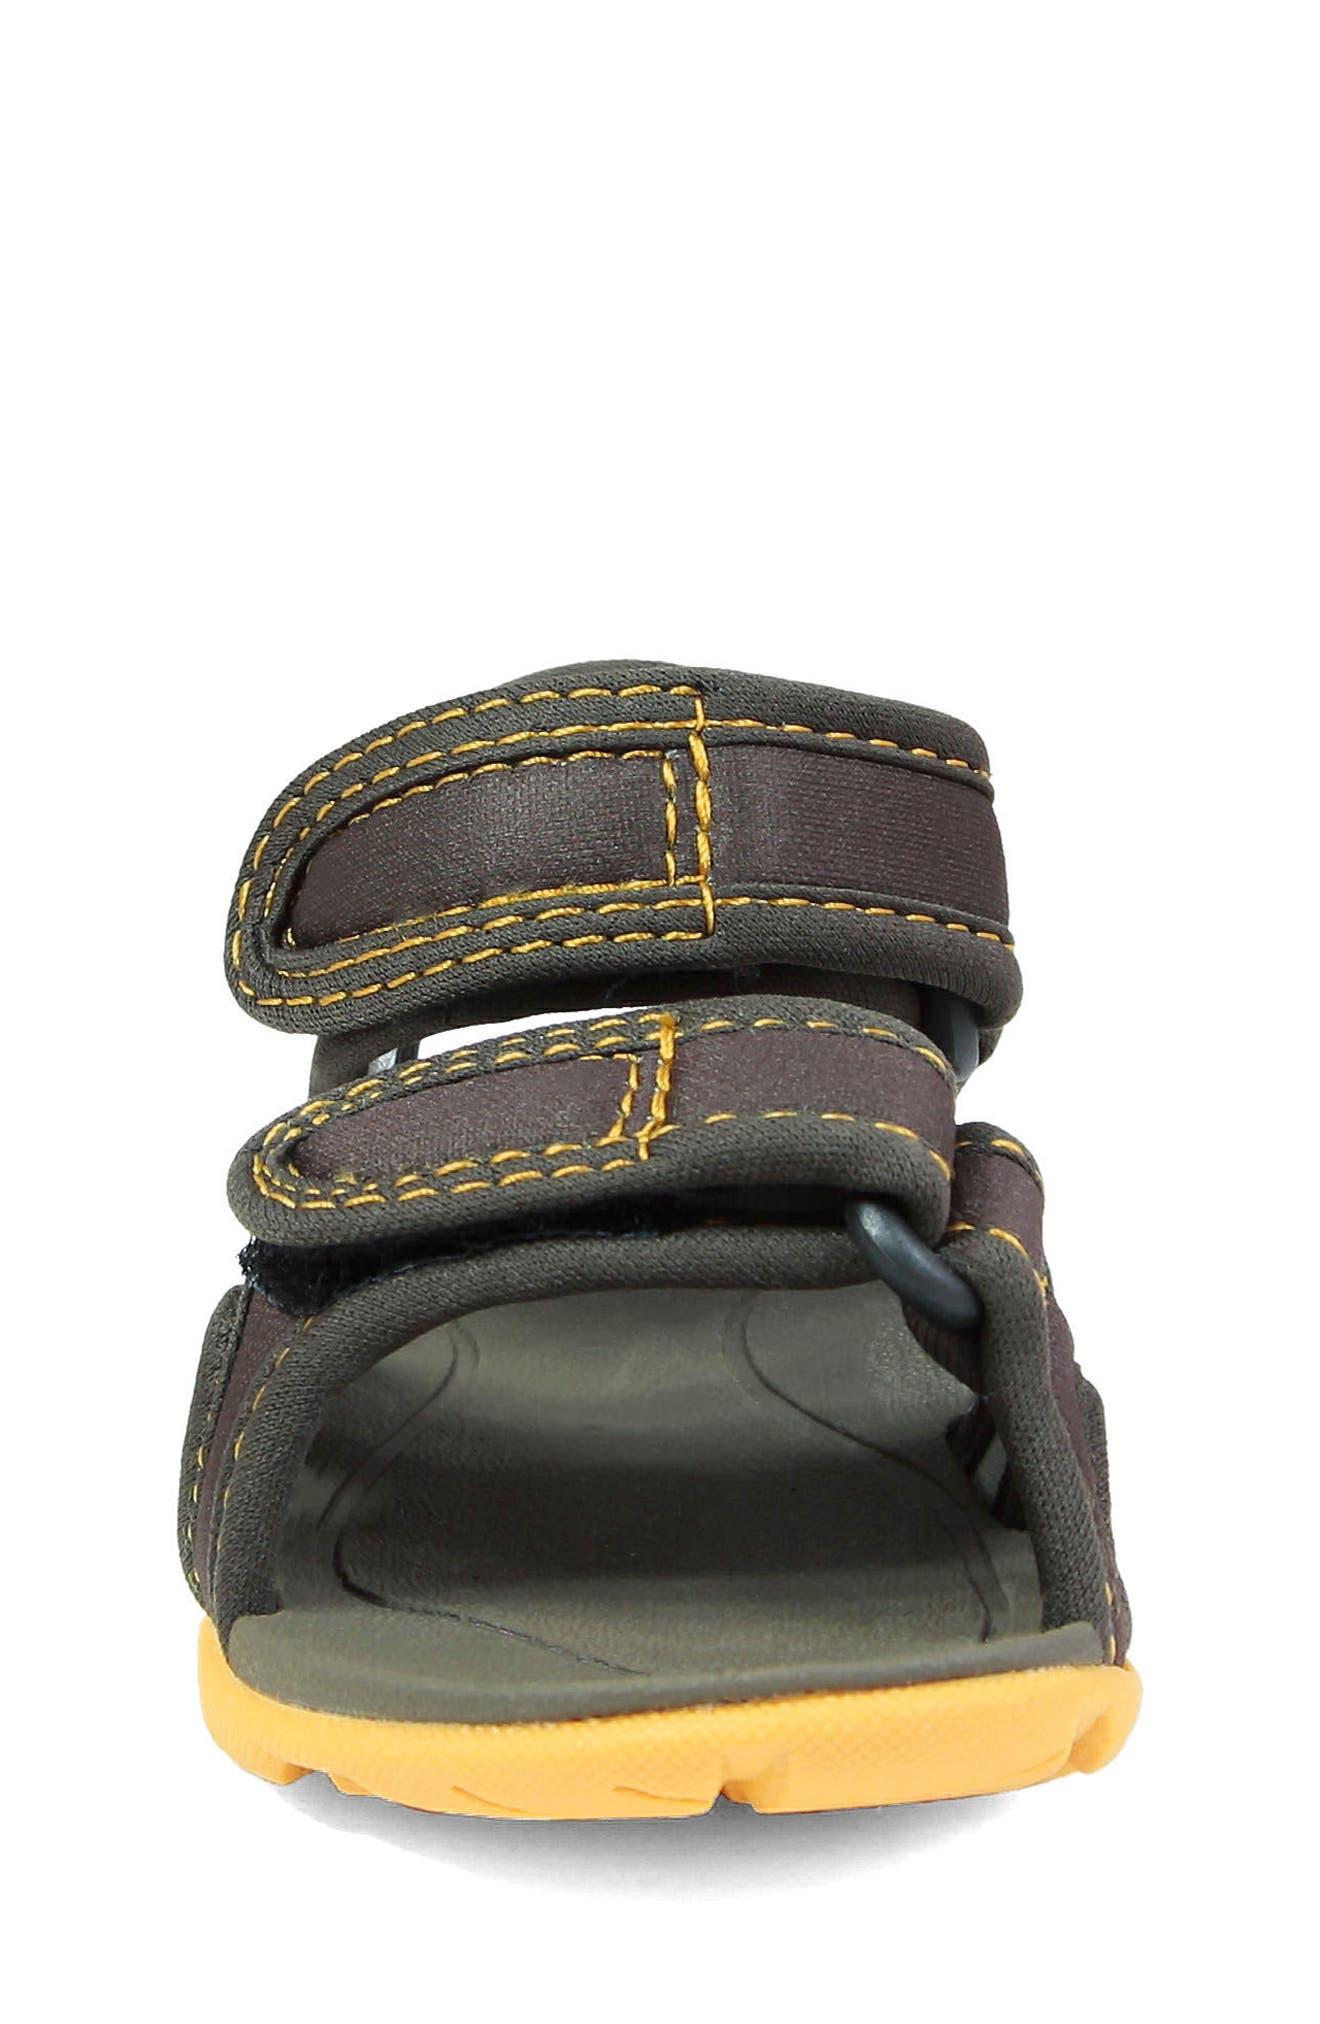 Whitefish Waterproof Sandal,                             Alternate thumbnail 4, color,                             Olive Multi